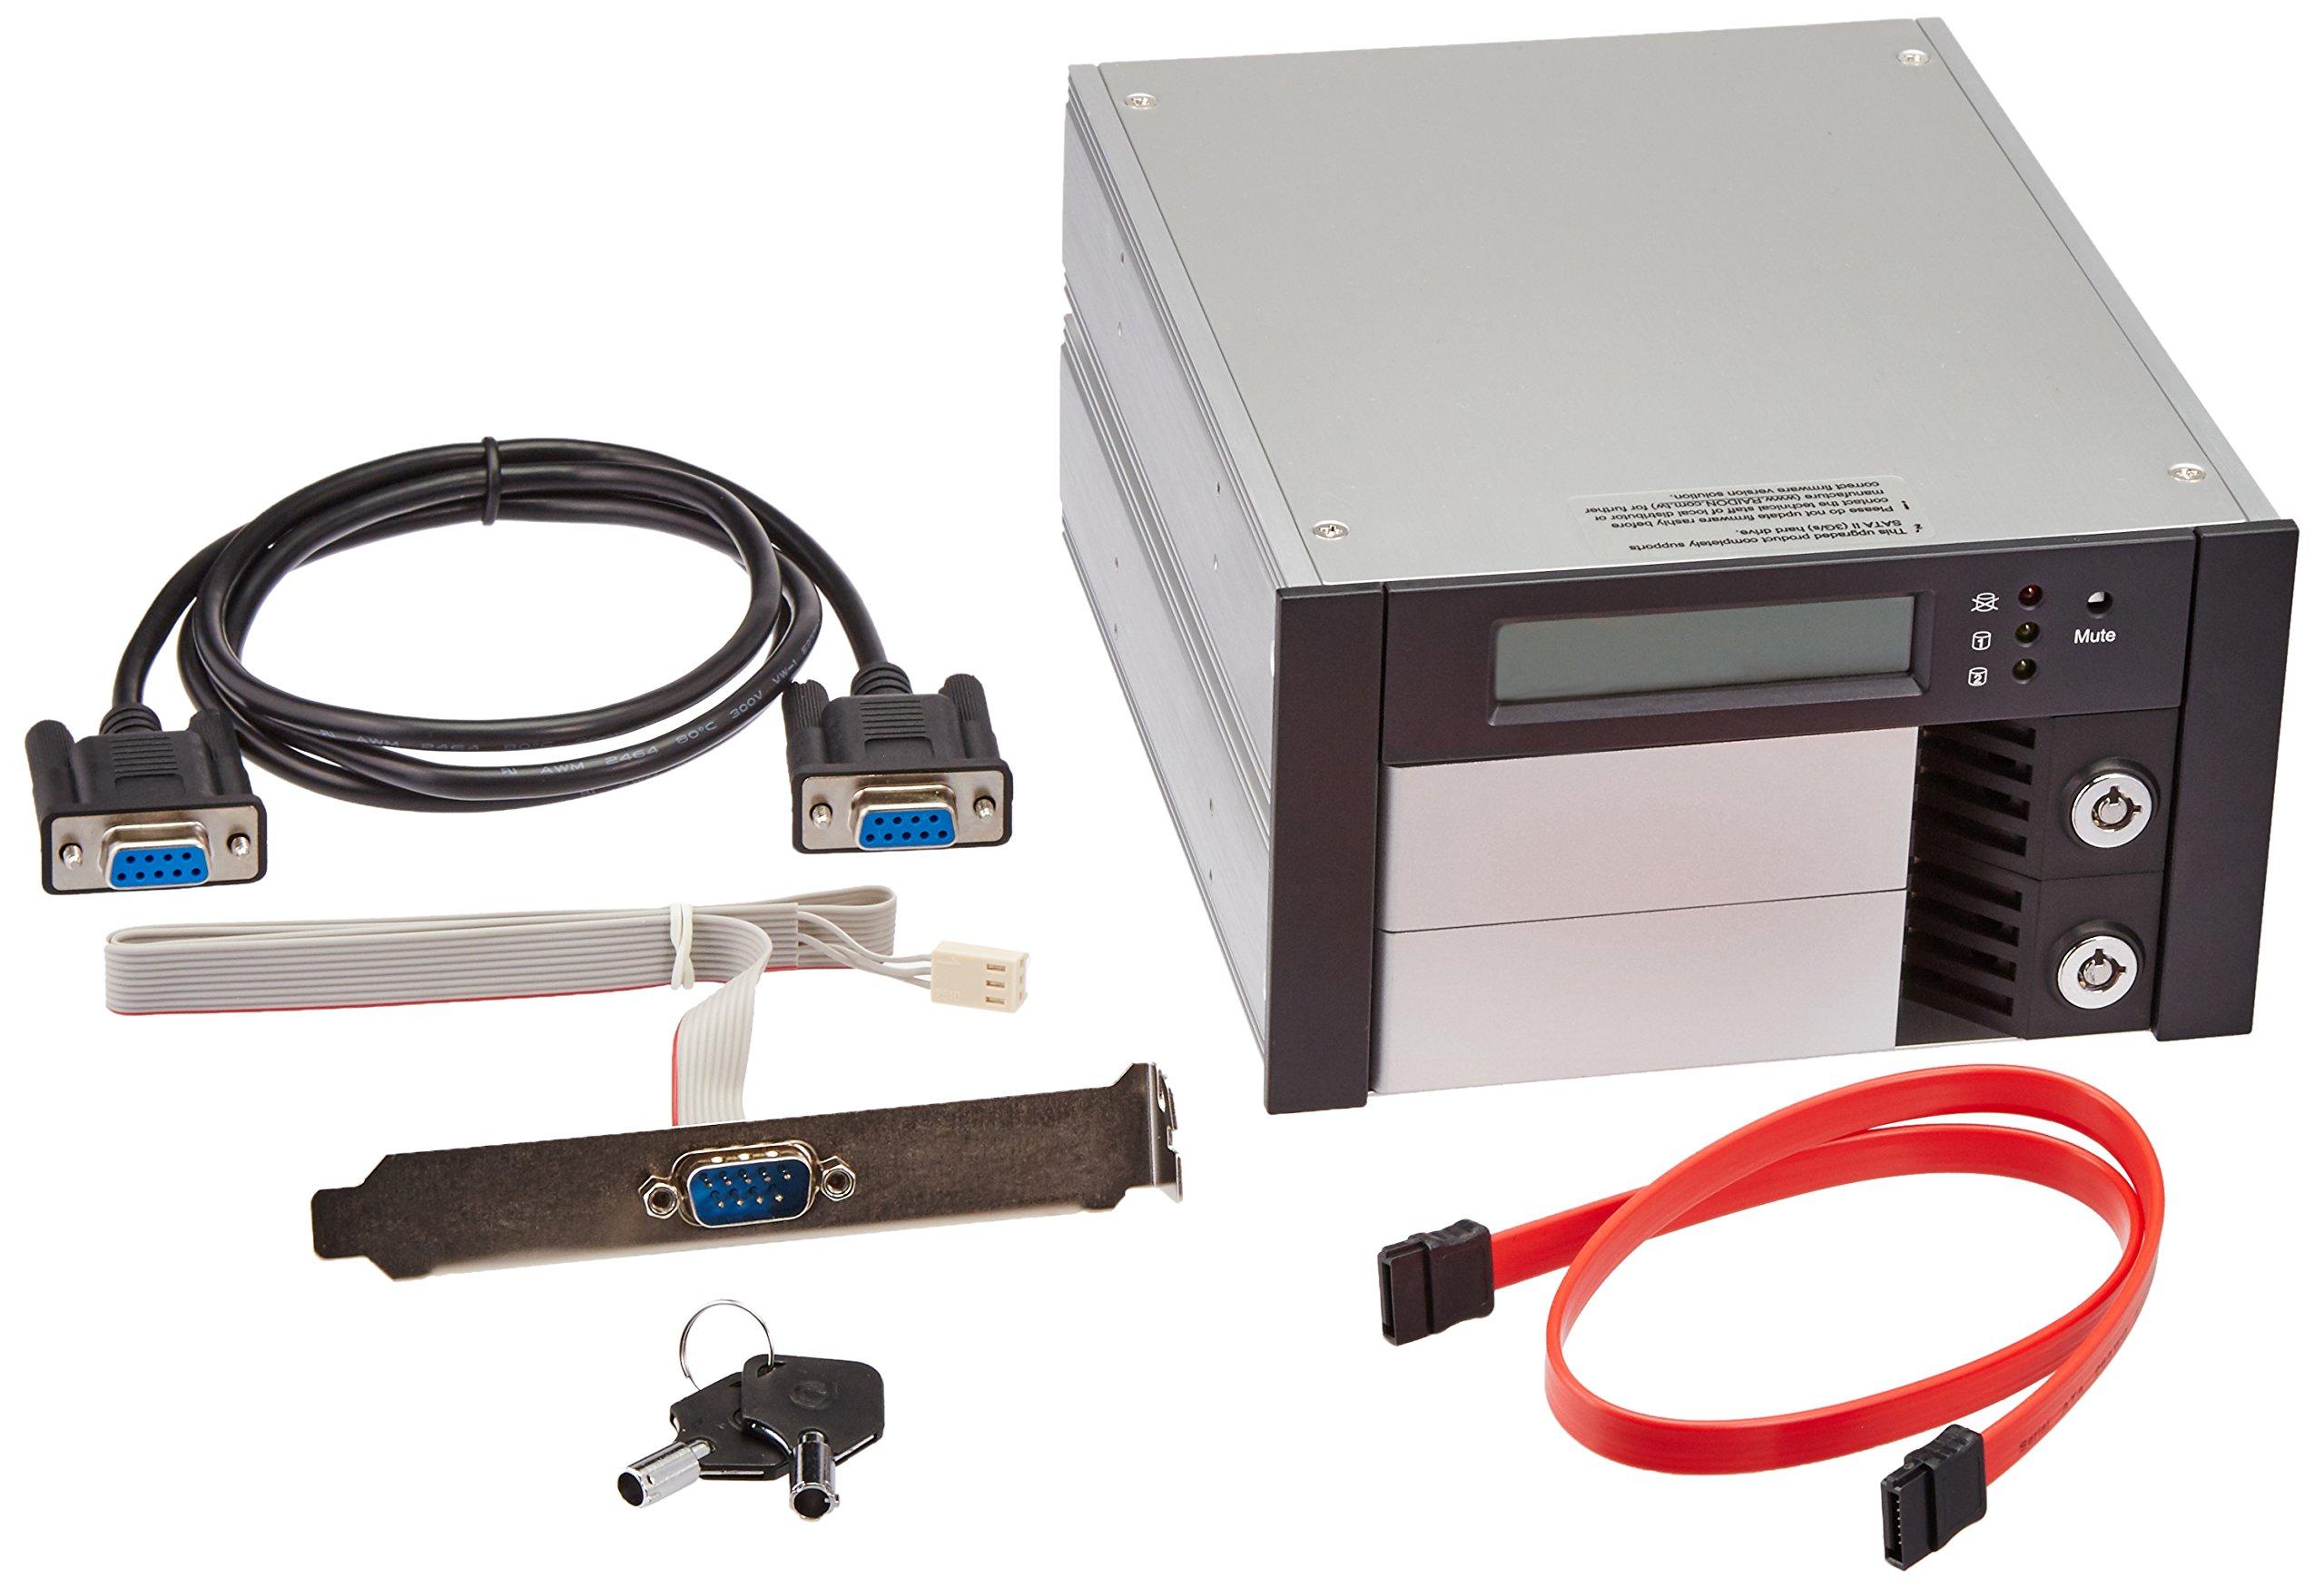 RAIDON SR2611-2S-S2R HDD RAID Storage